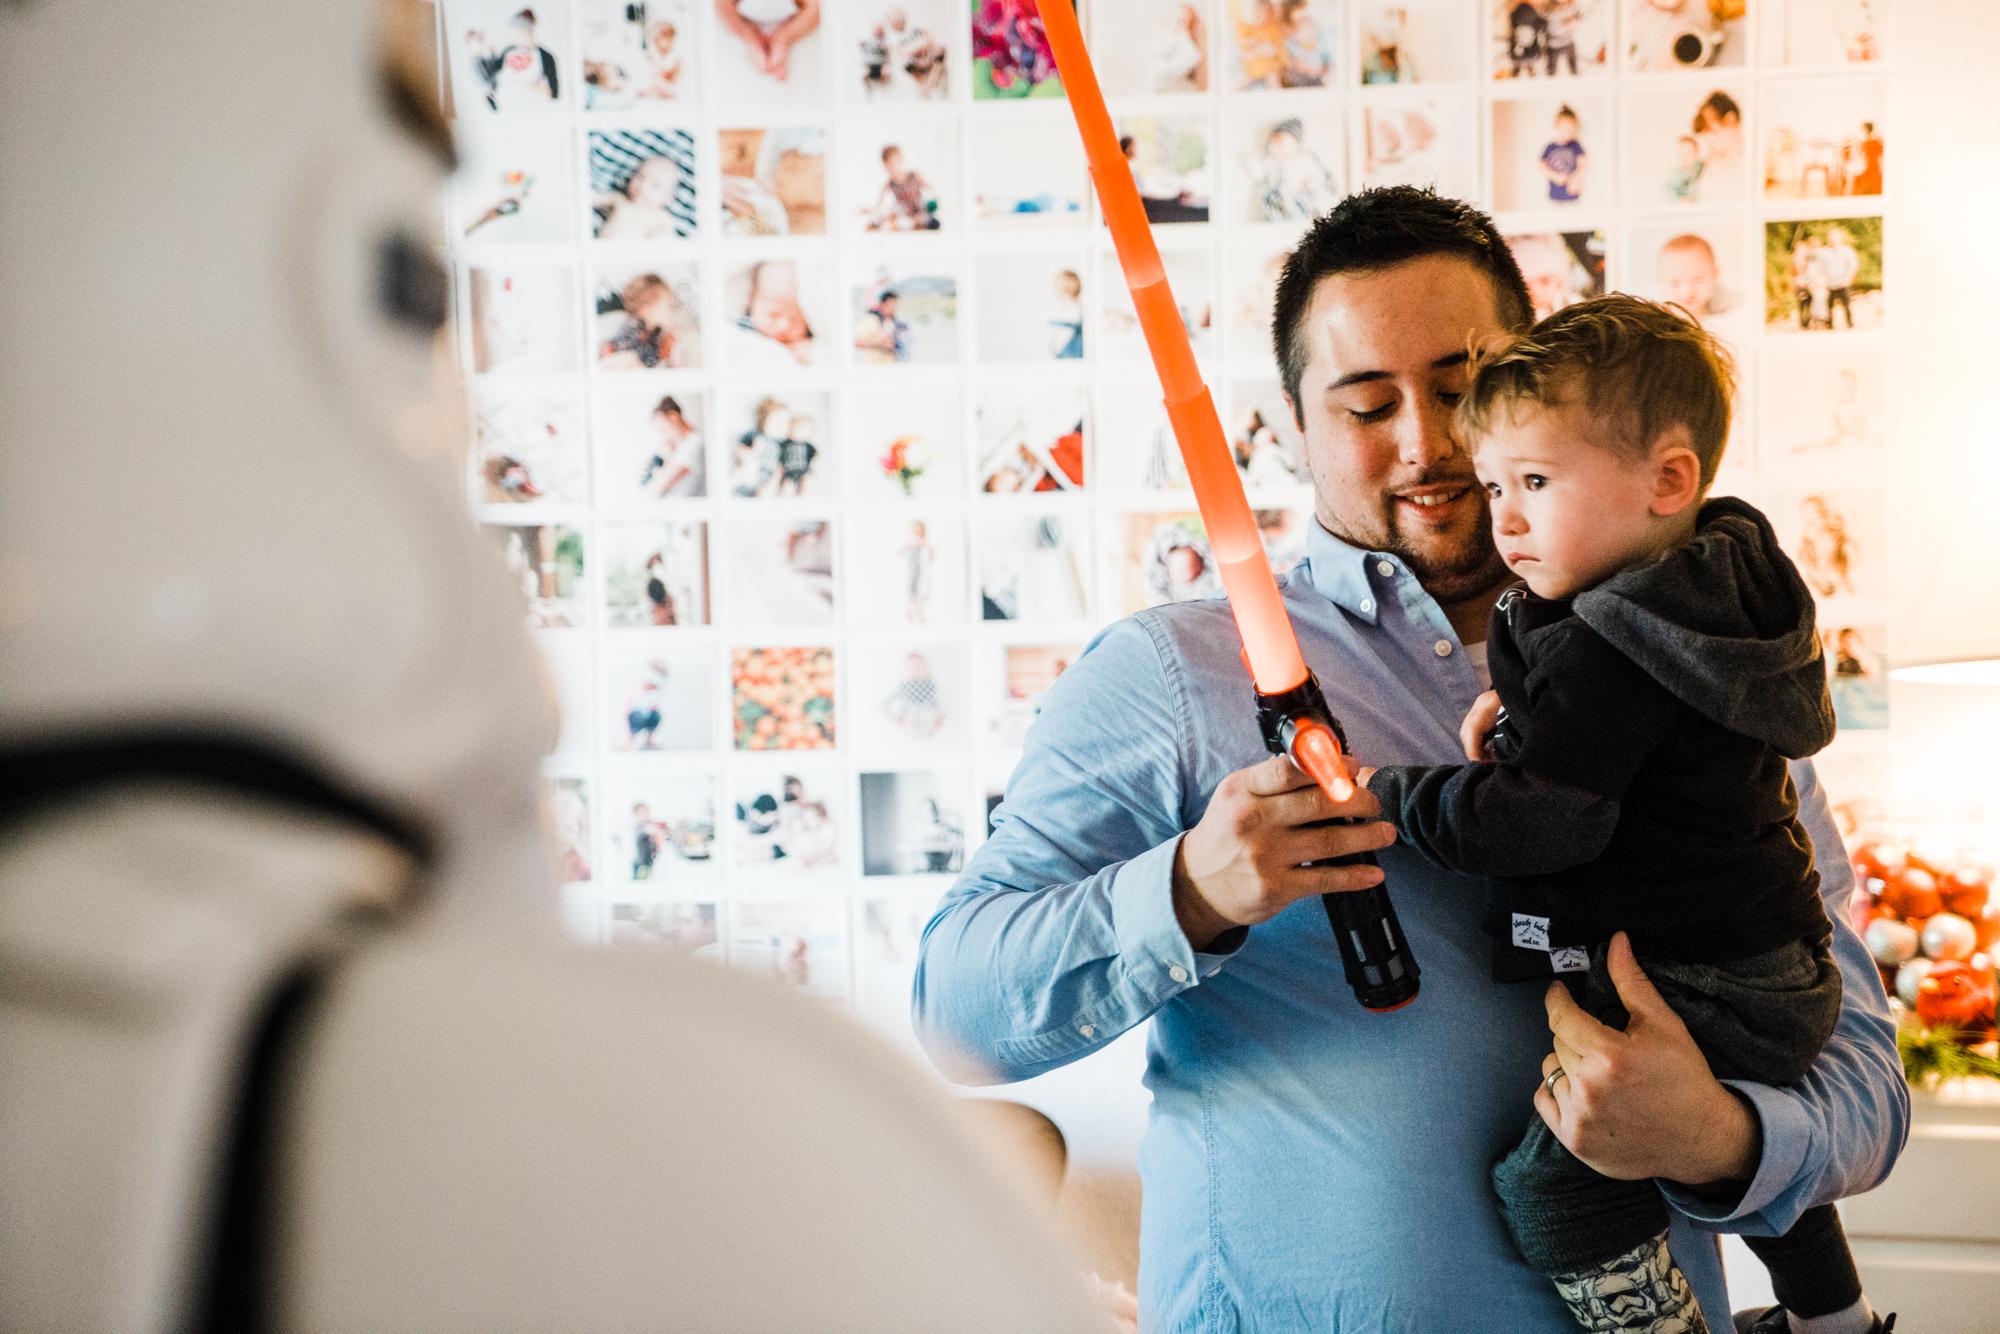 A Star Wars Holiday (Photo Story)-12.jpg